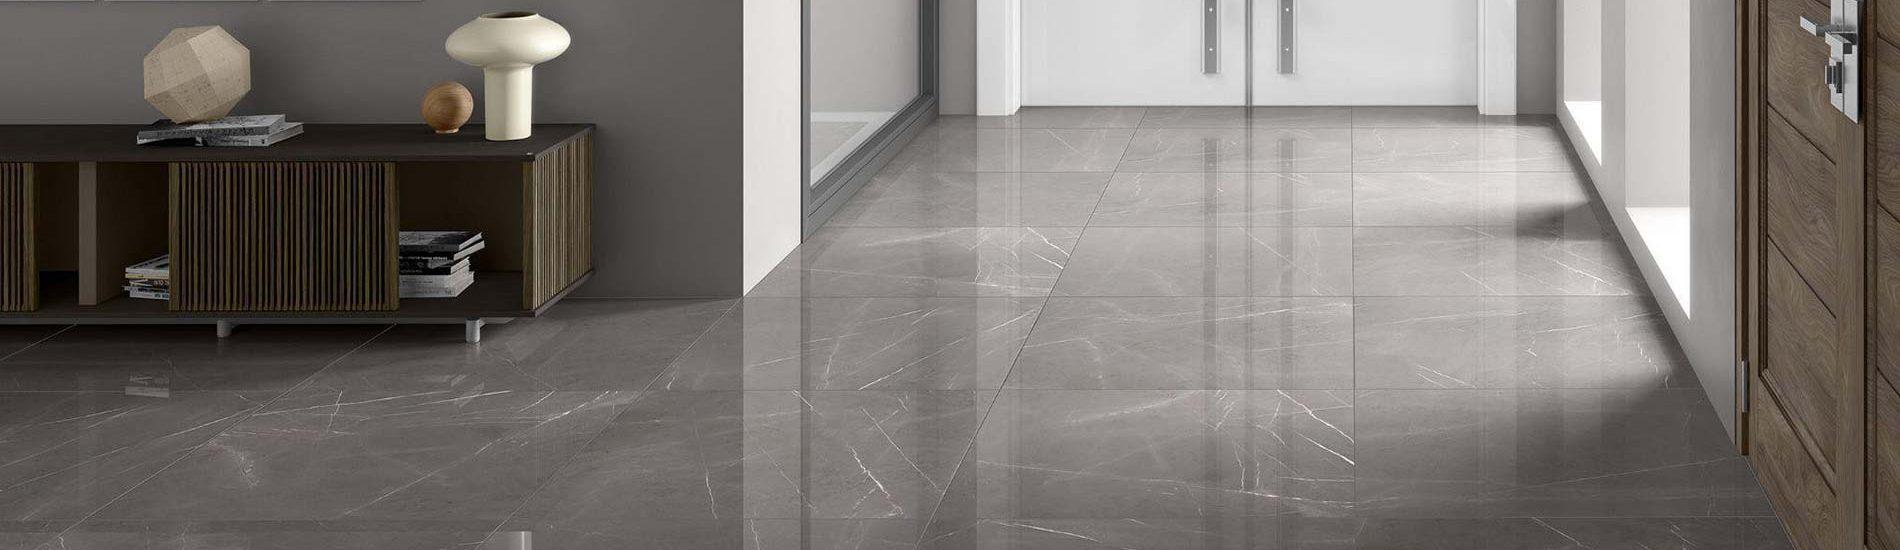 banner-marble+-spanish-marble-look-deco-floor-wall-tile-newker-anaheim